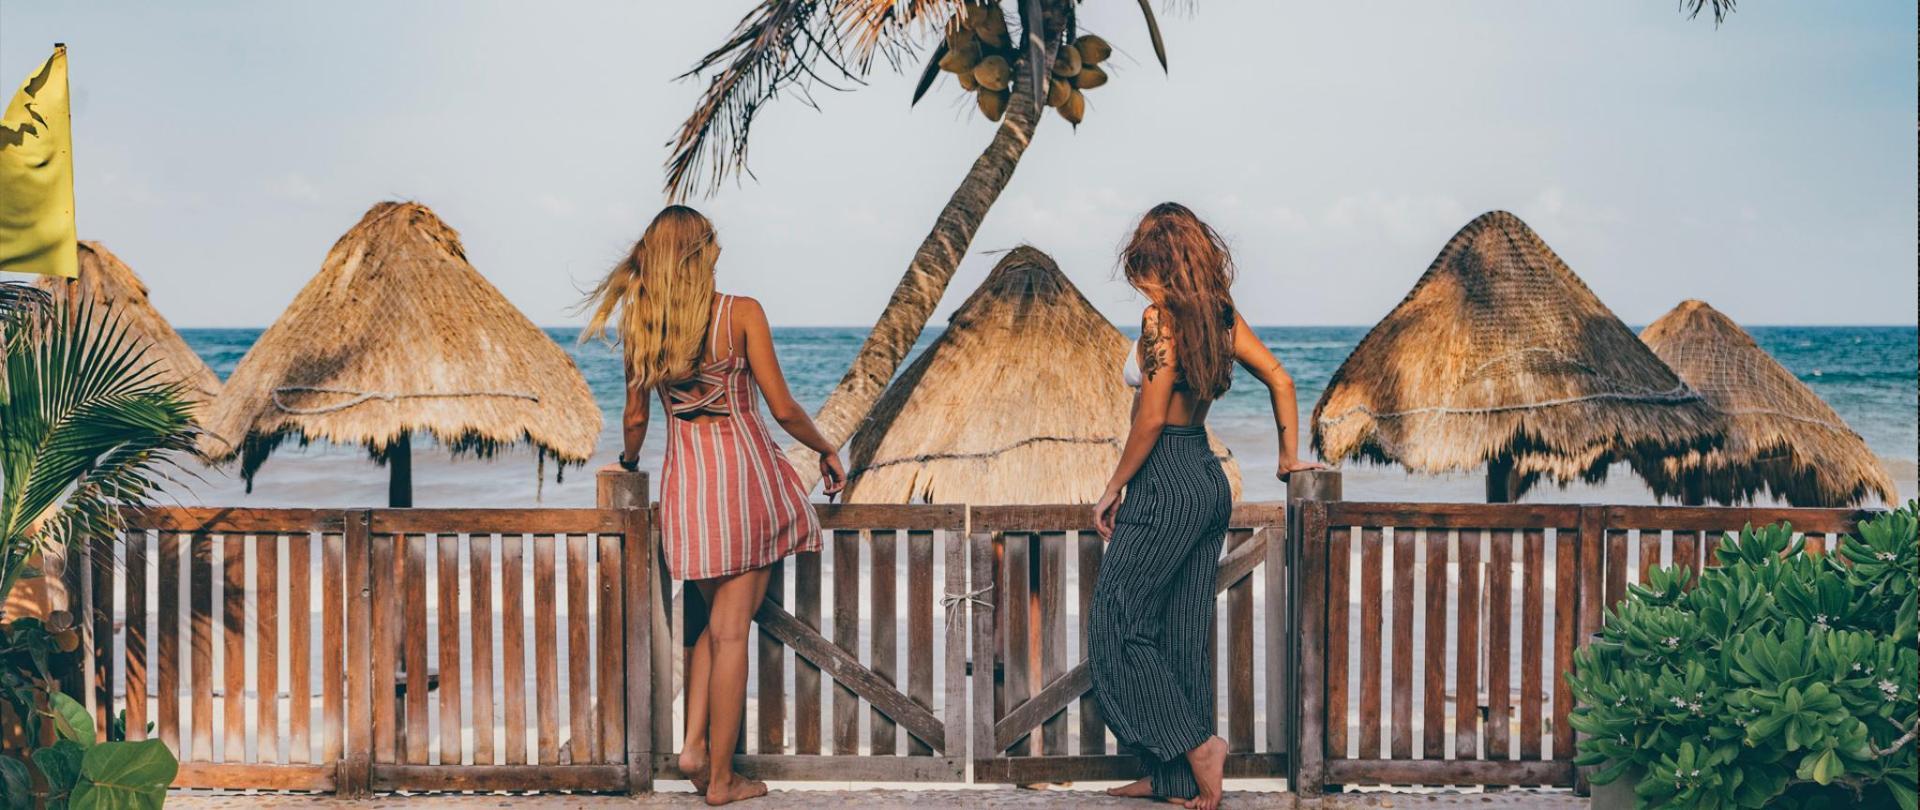 CALA new 2020 ragazze mare.jpg